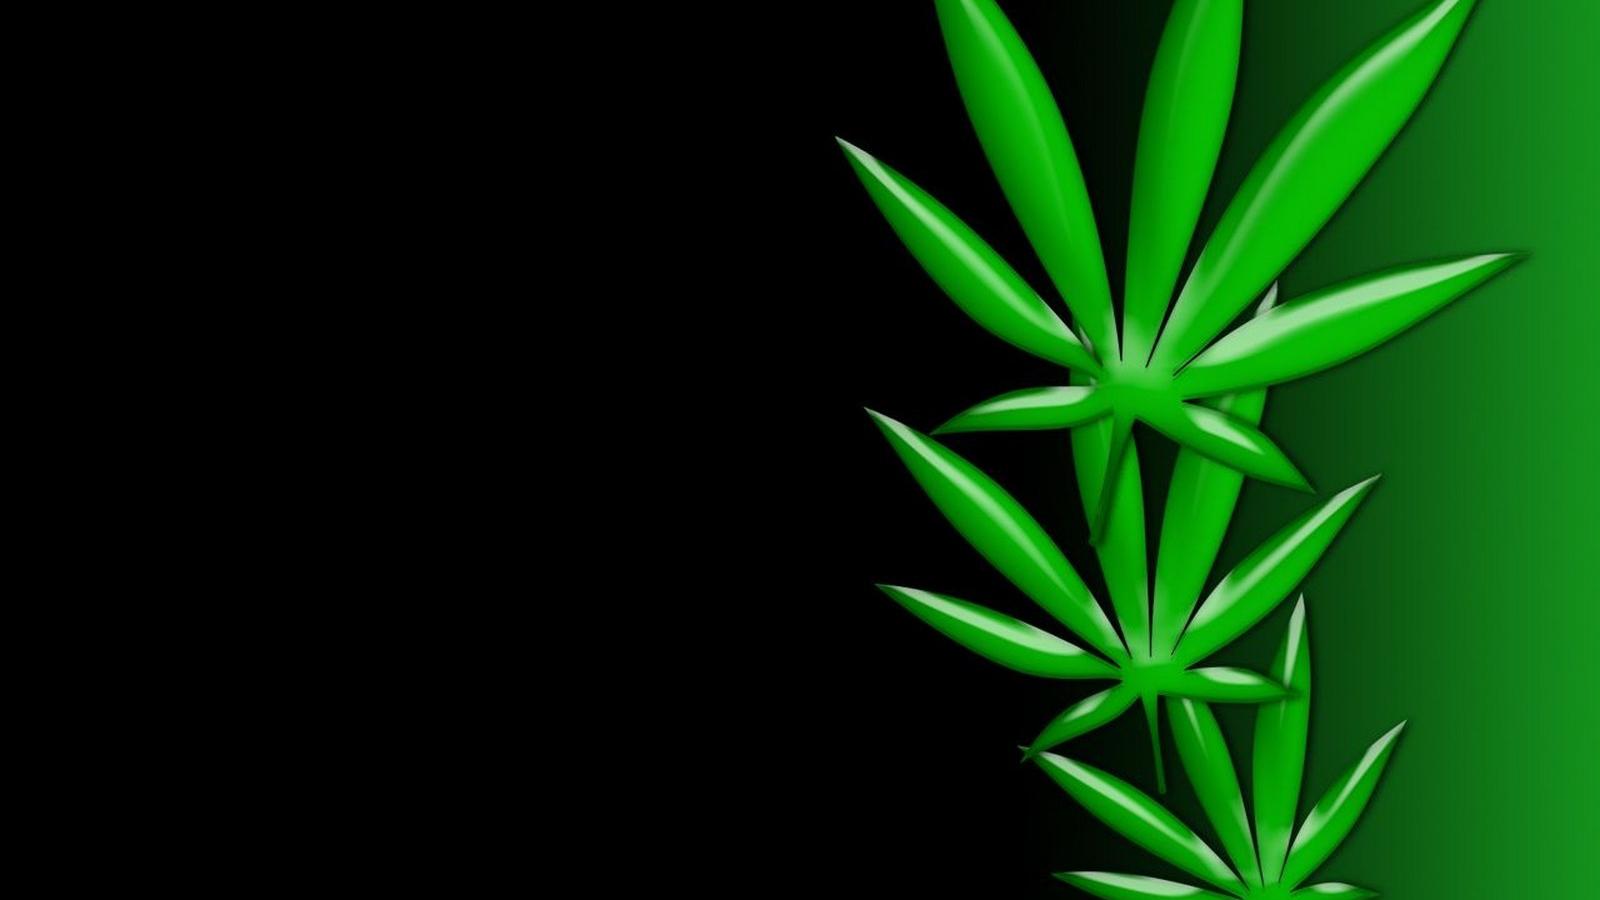 Free Download Weed Poster Wallpaper Art Weedpad Wallpapers